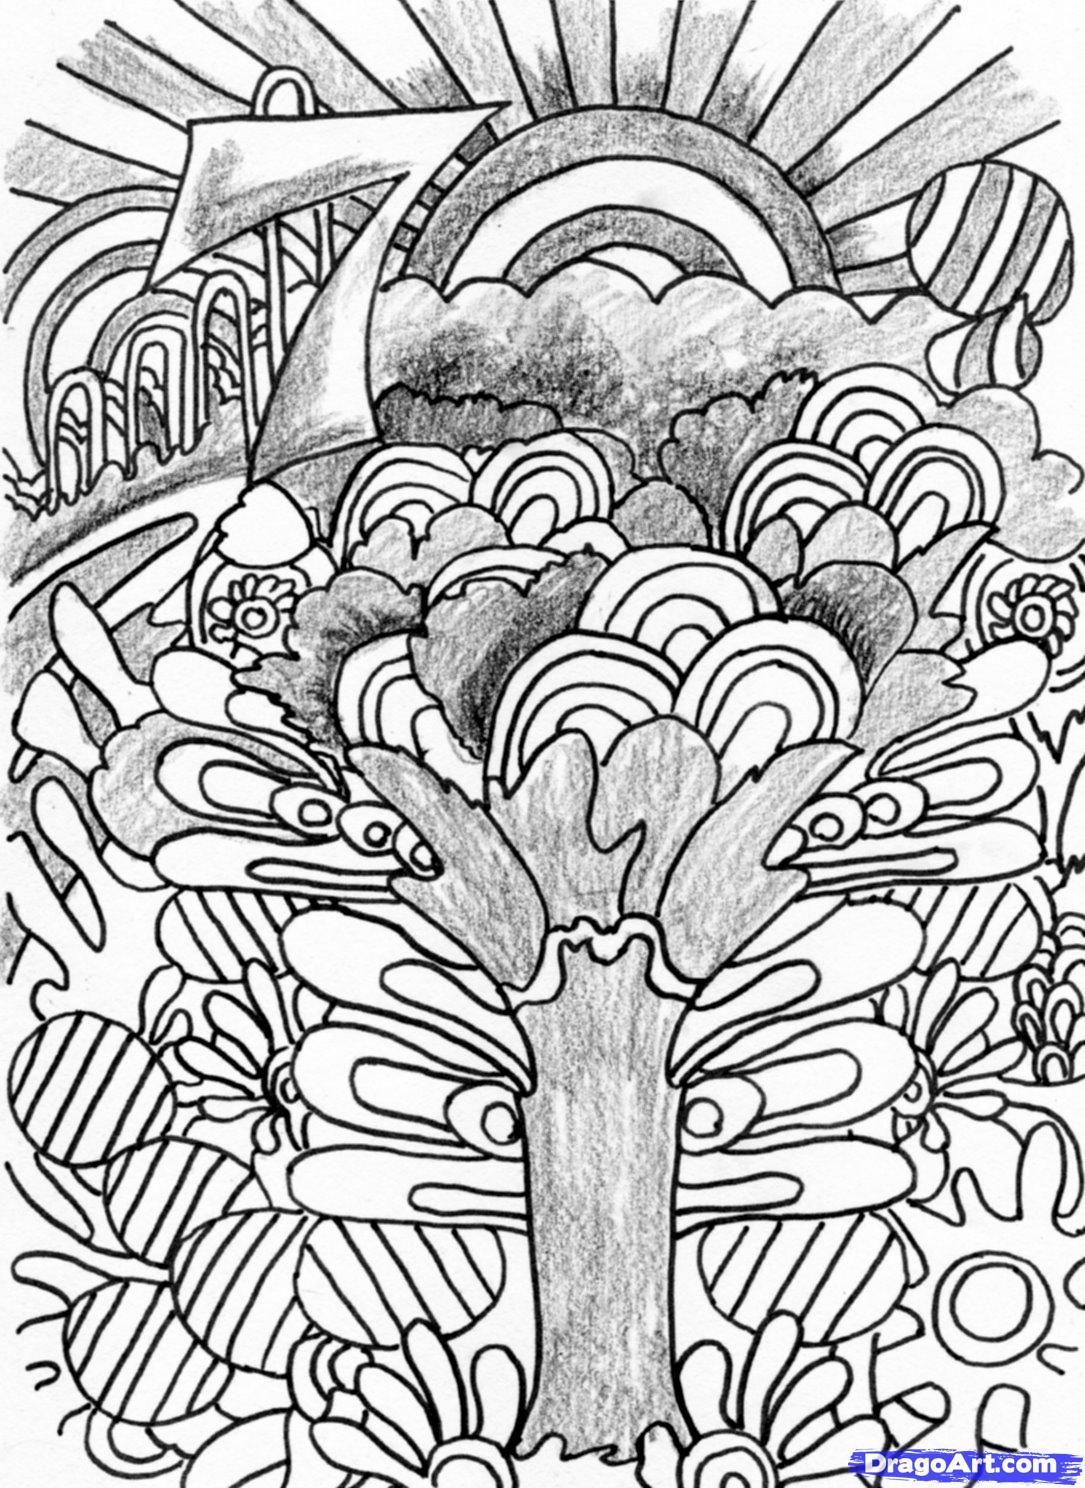 1085x1488 Simple Trippy Drawings Easy Trippy Drawings Draw Shrooms Shrooms